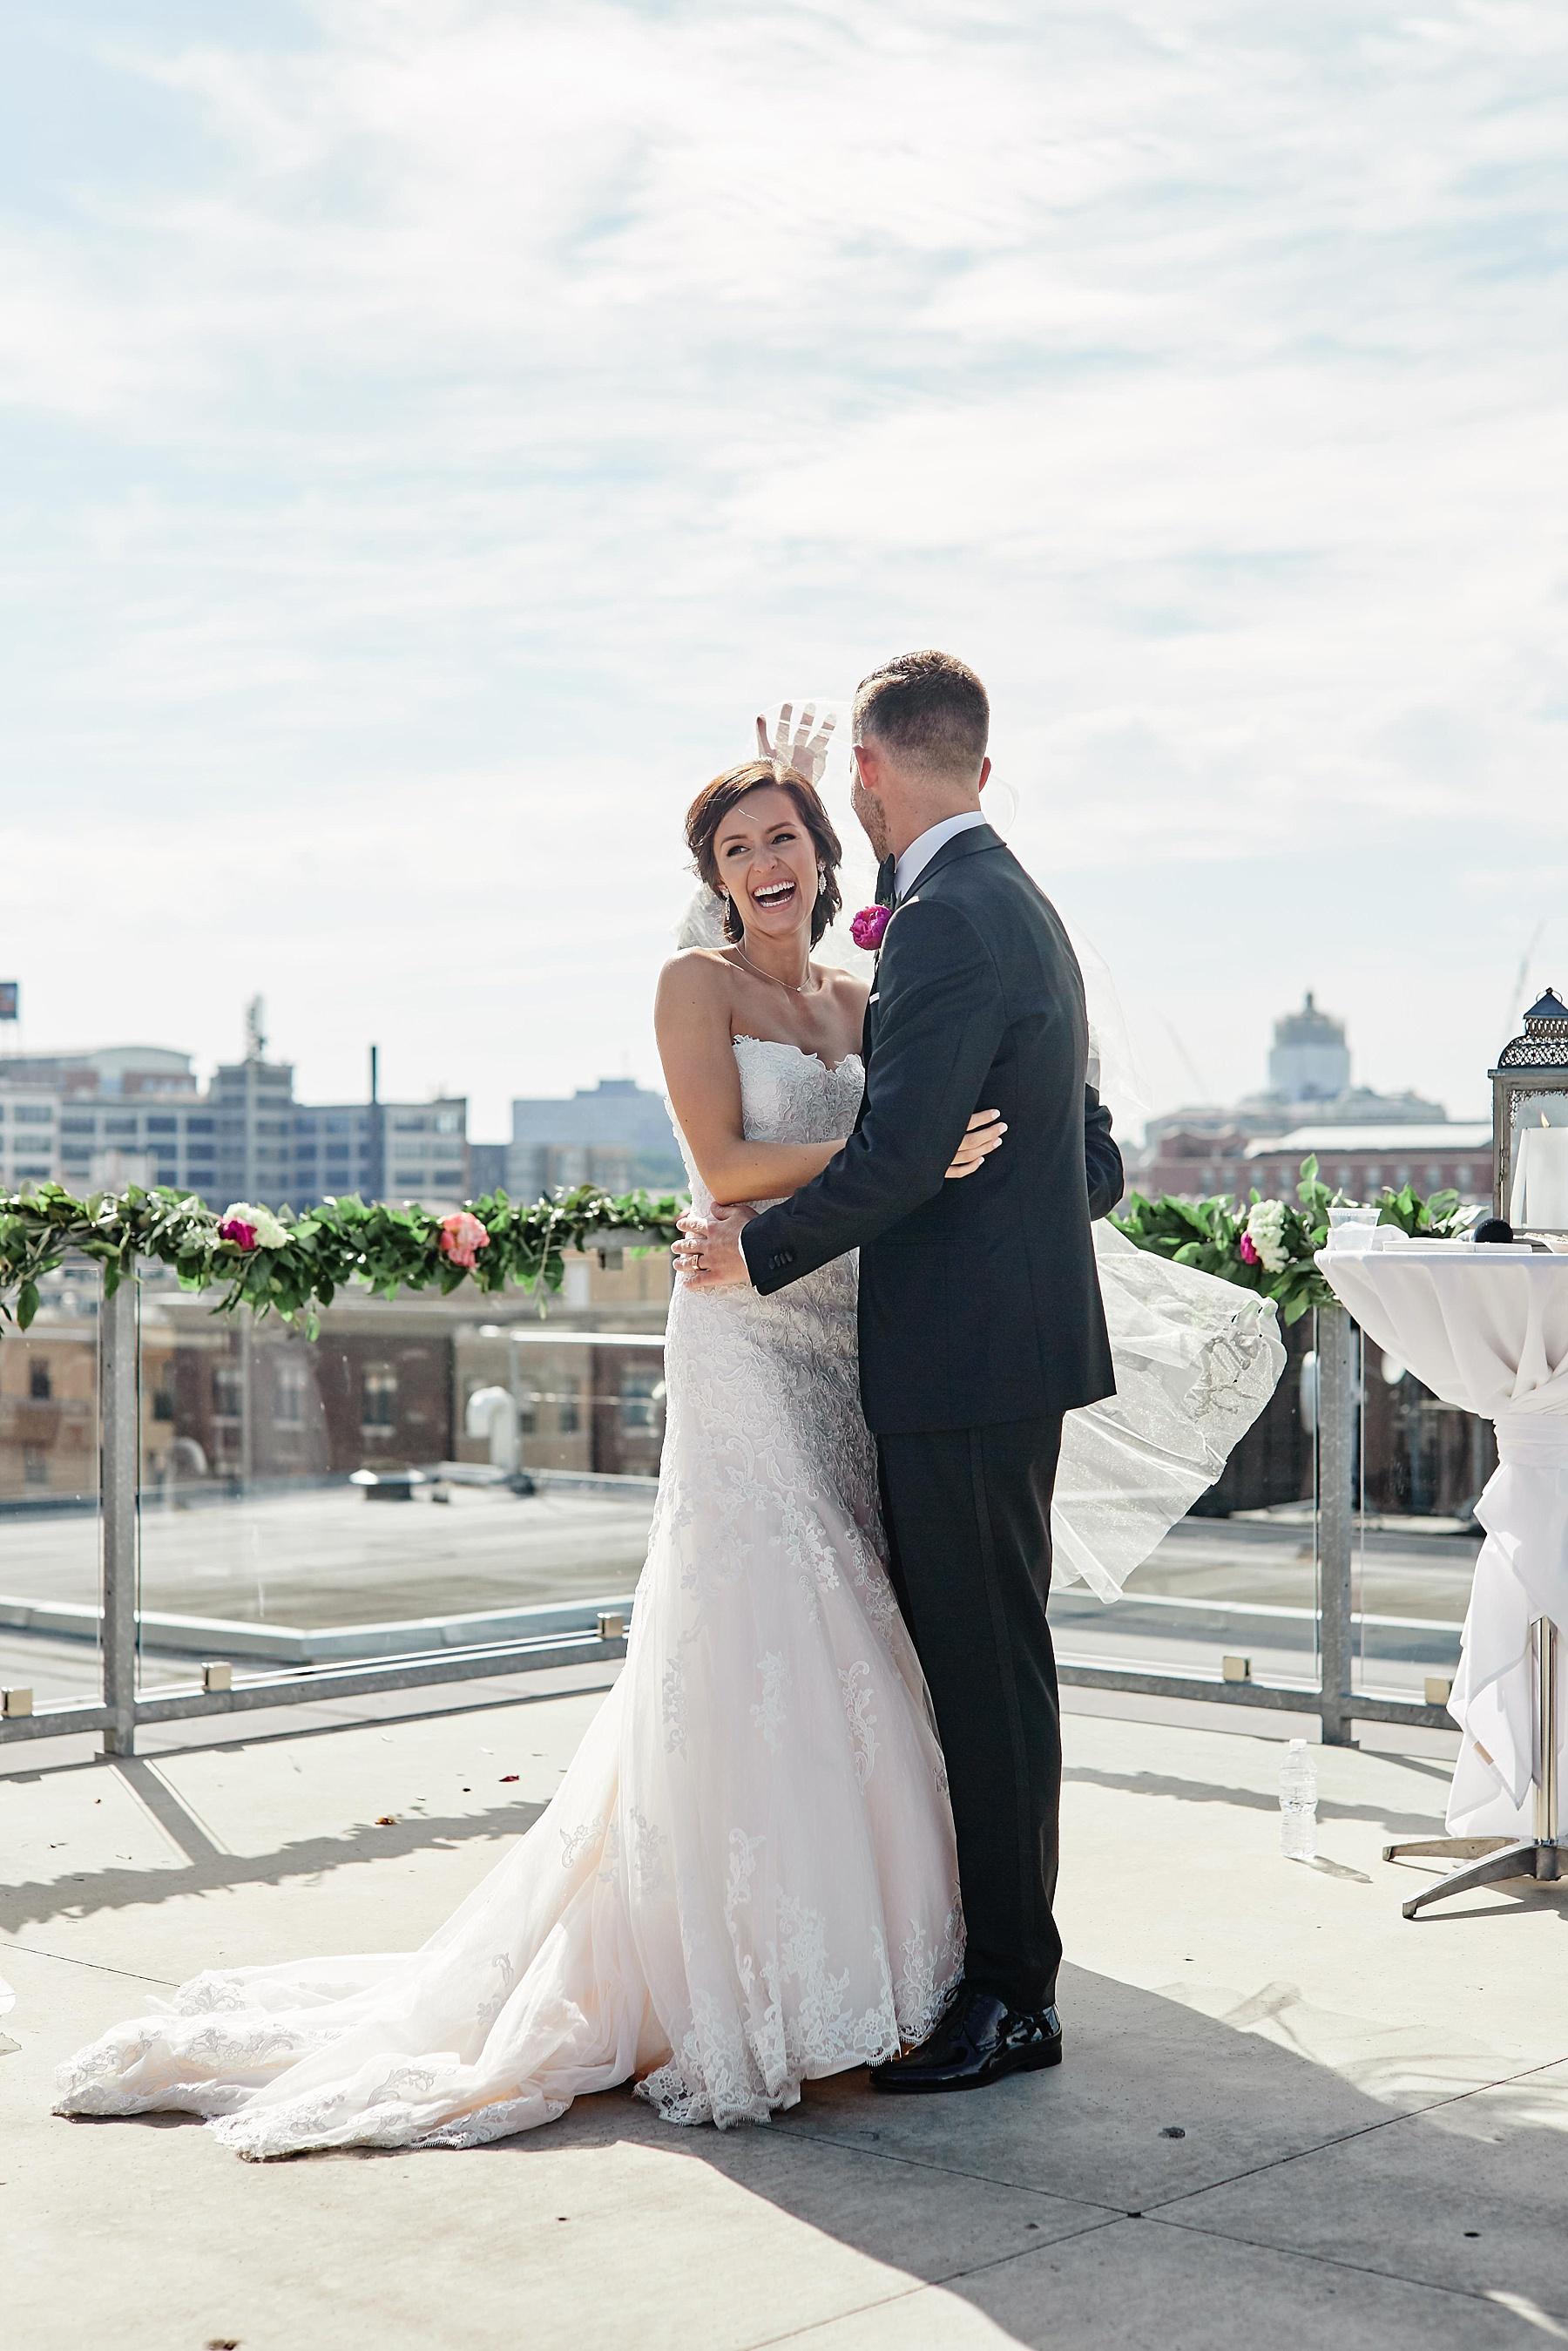 ABULAE-Wedding-Saint-paul-MN-Josh-Sofia-Wedding-Mears-Park_0774.jpg